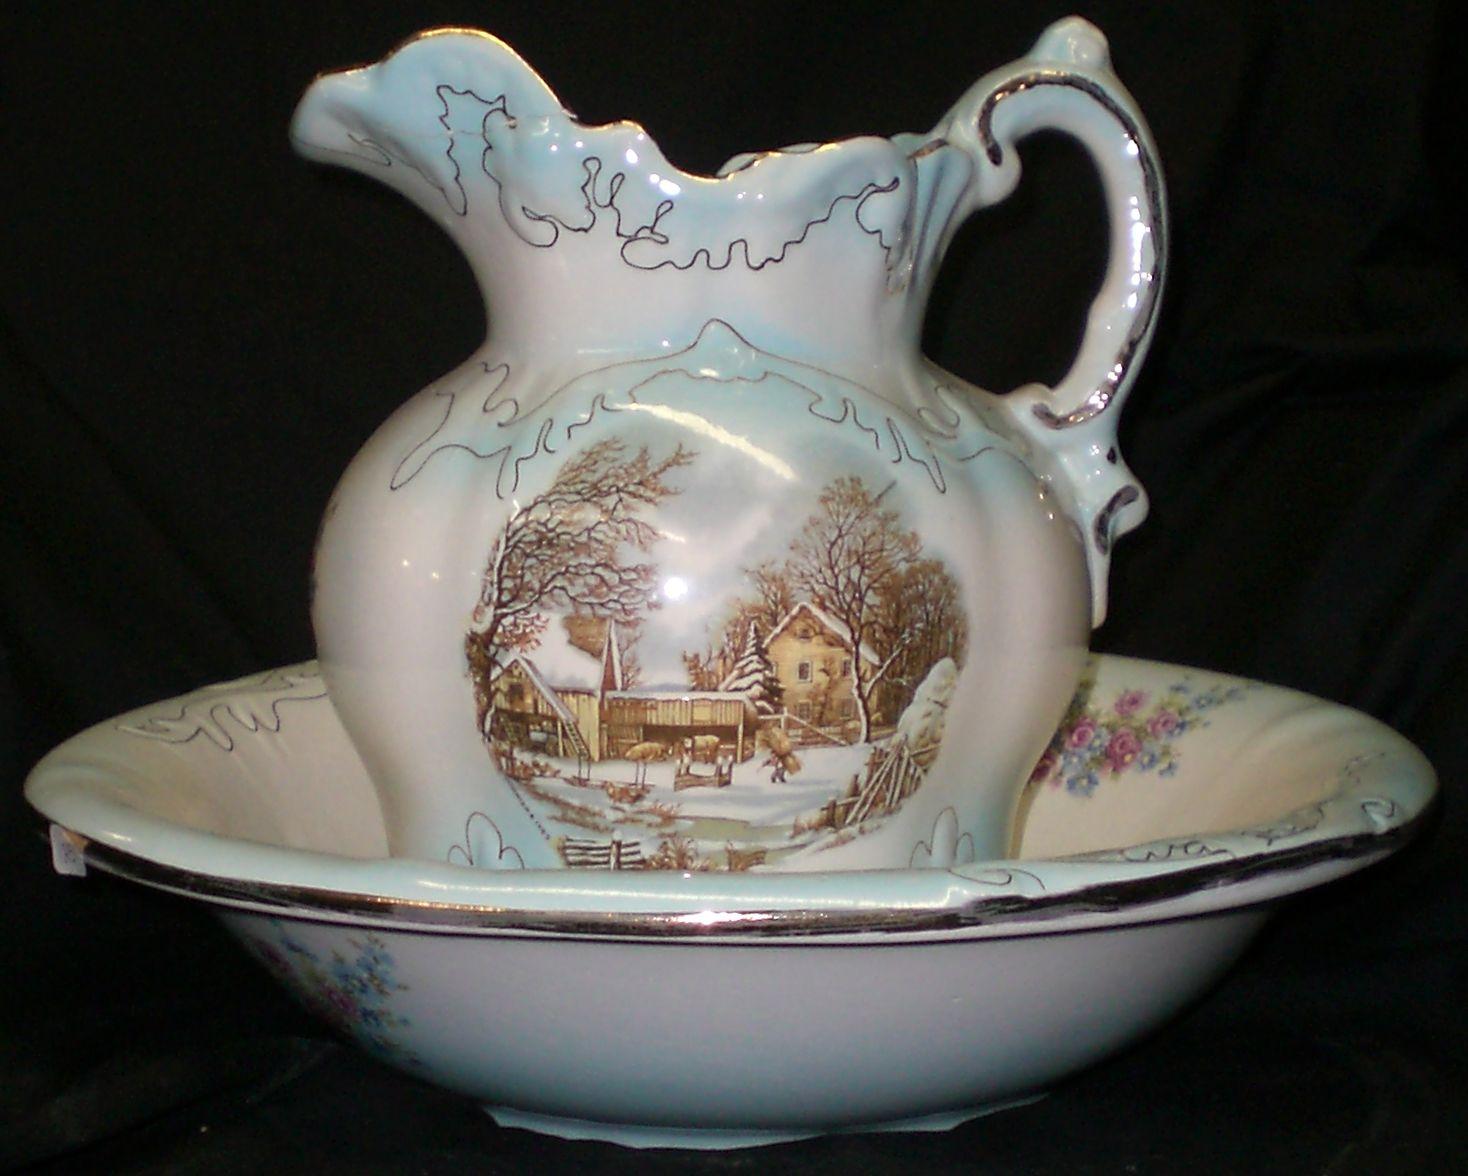 antique pitcher and bowl set google search pitcher and bowl sets pinterest. Black Bedroom Furniture Sets. Home Design Ideas